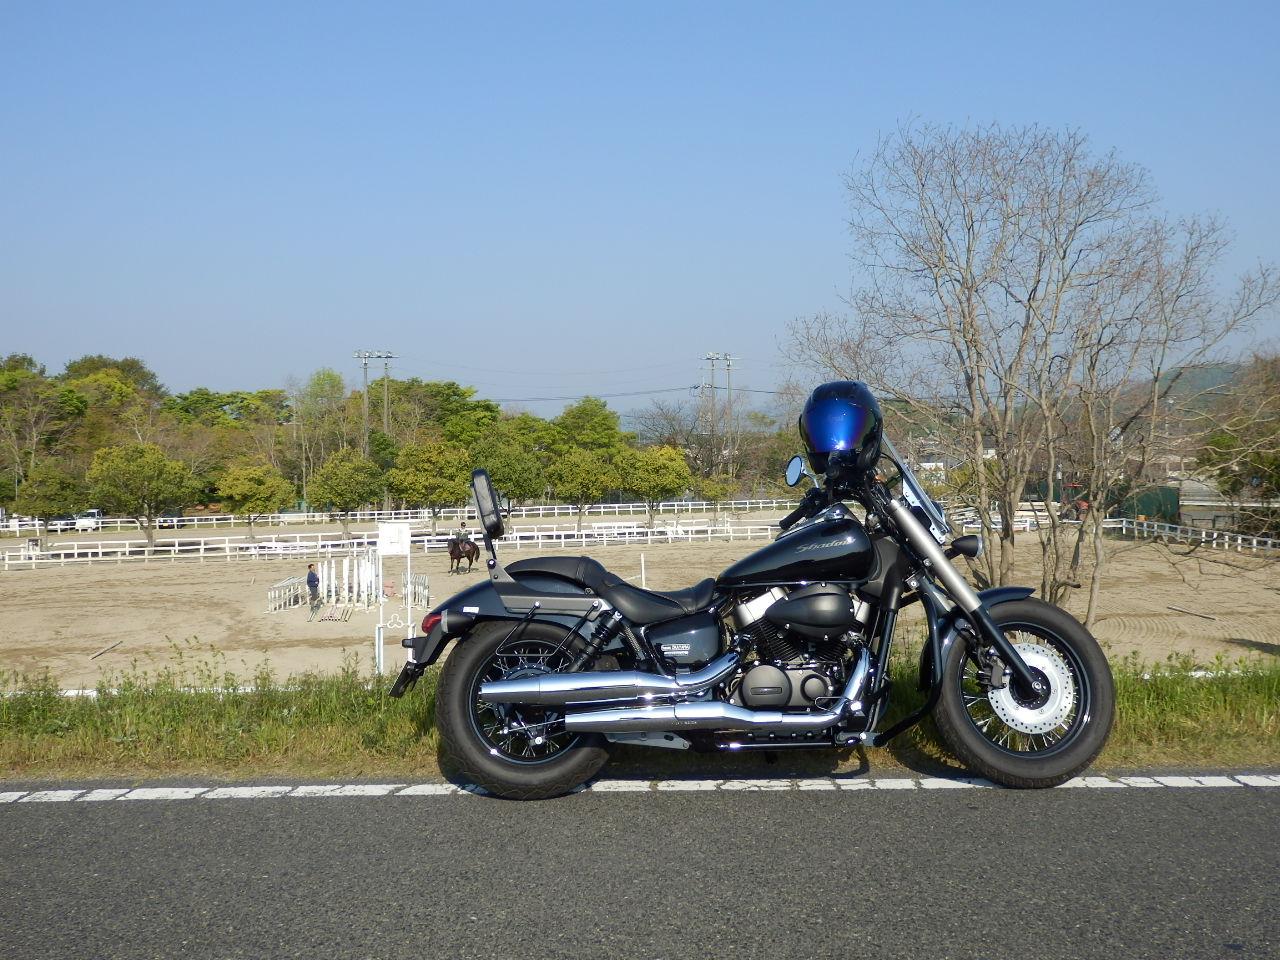 P5050001.jpg